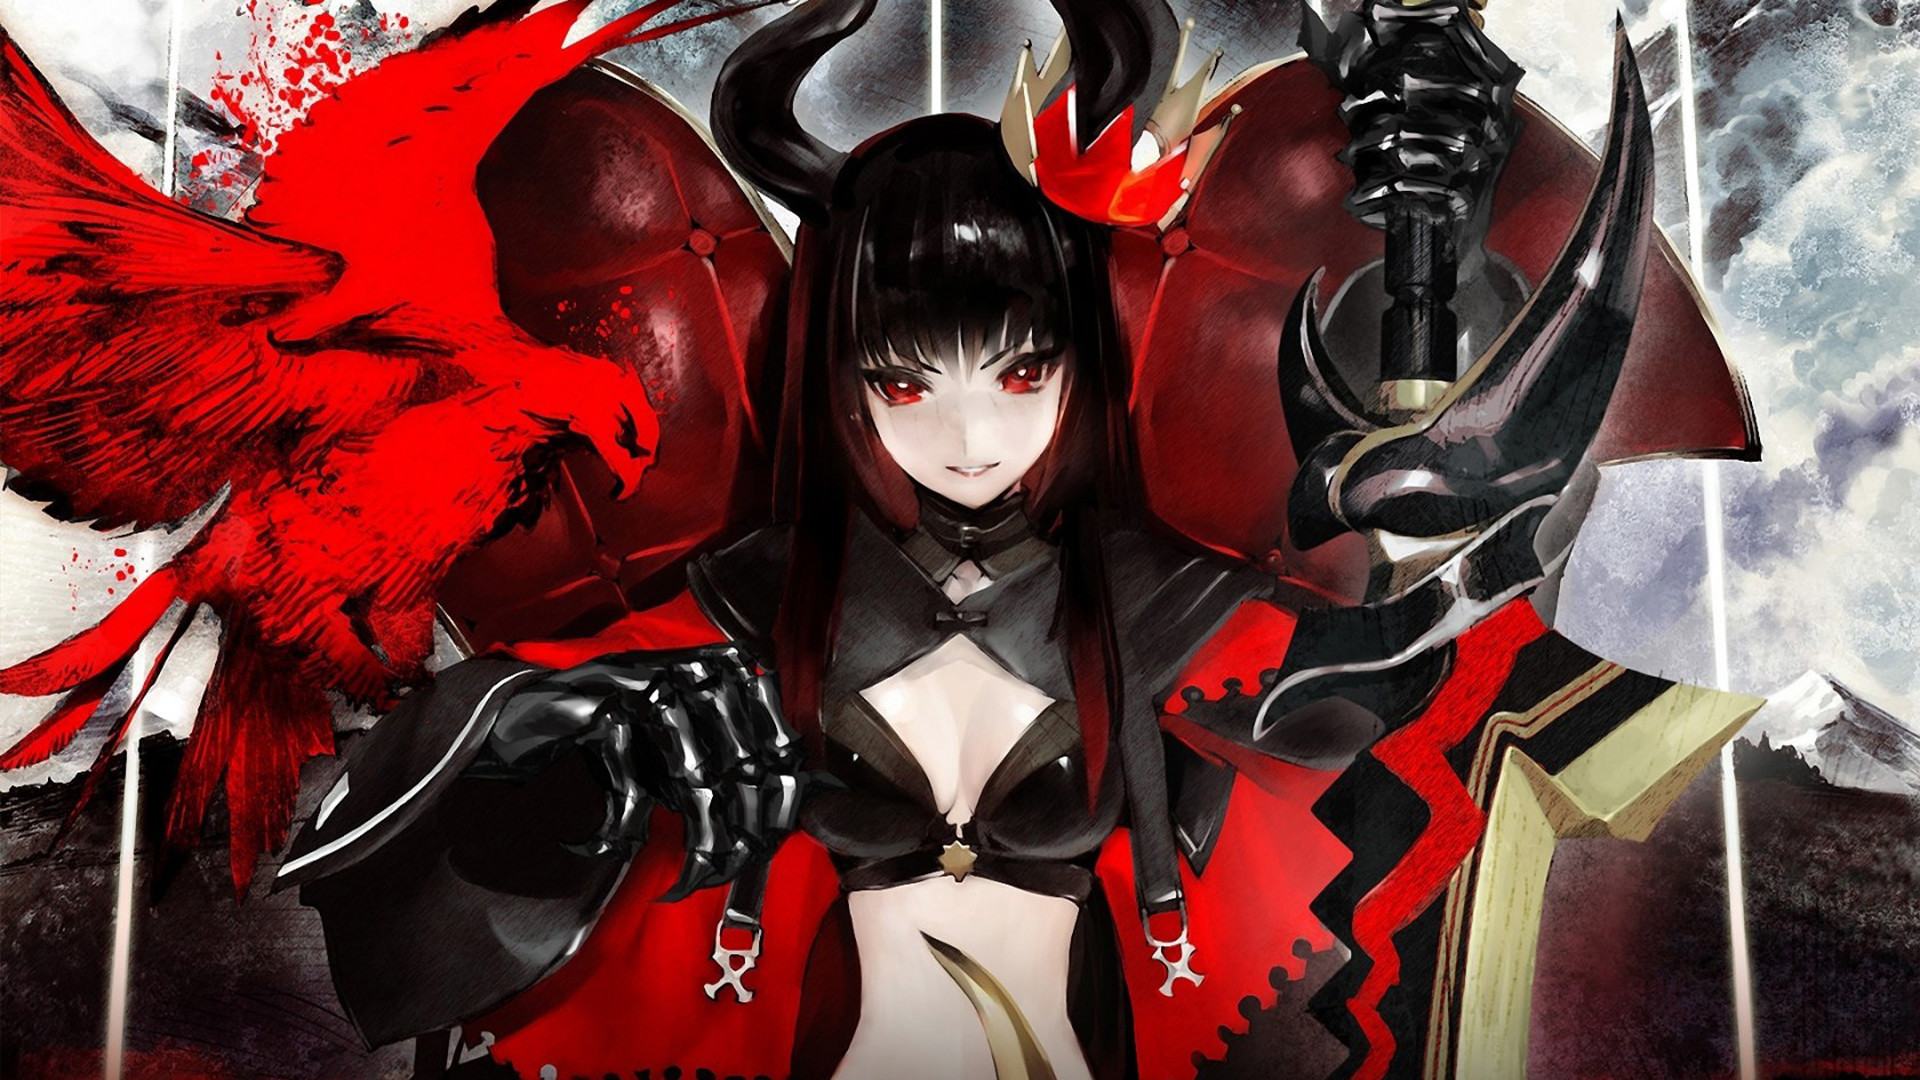 Black Gold Saw Anime Girl